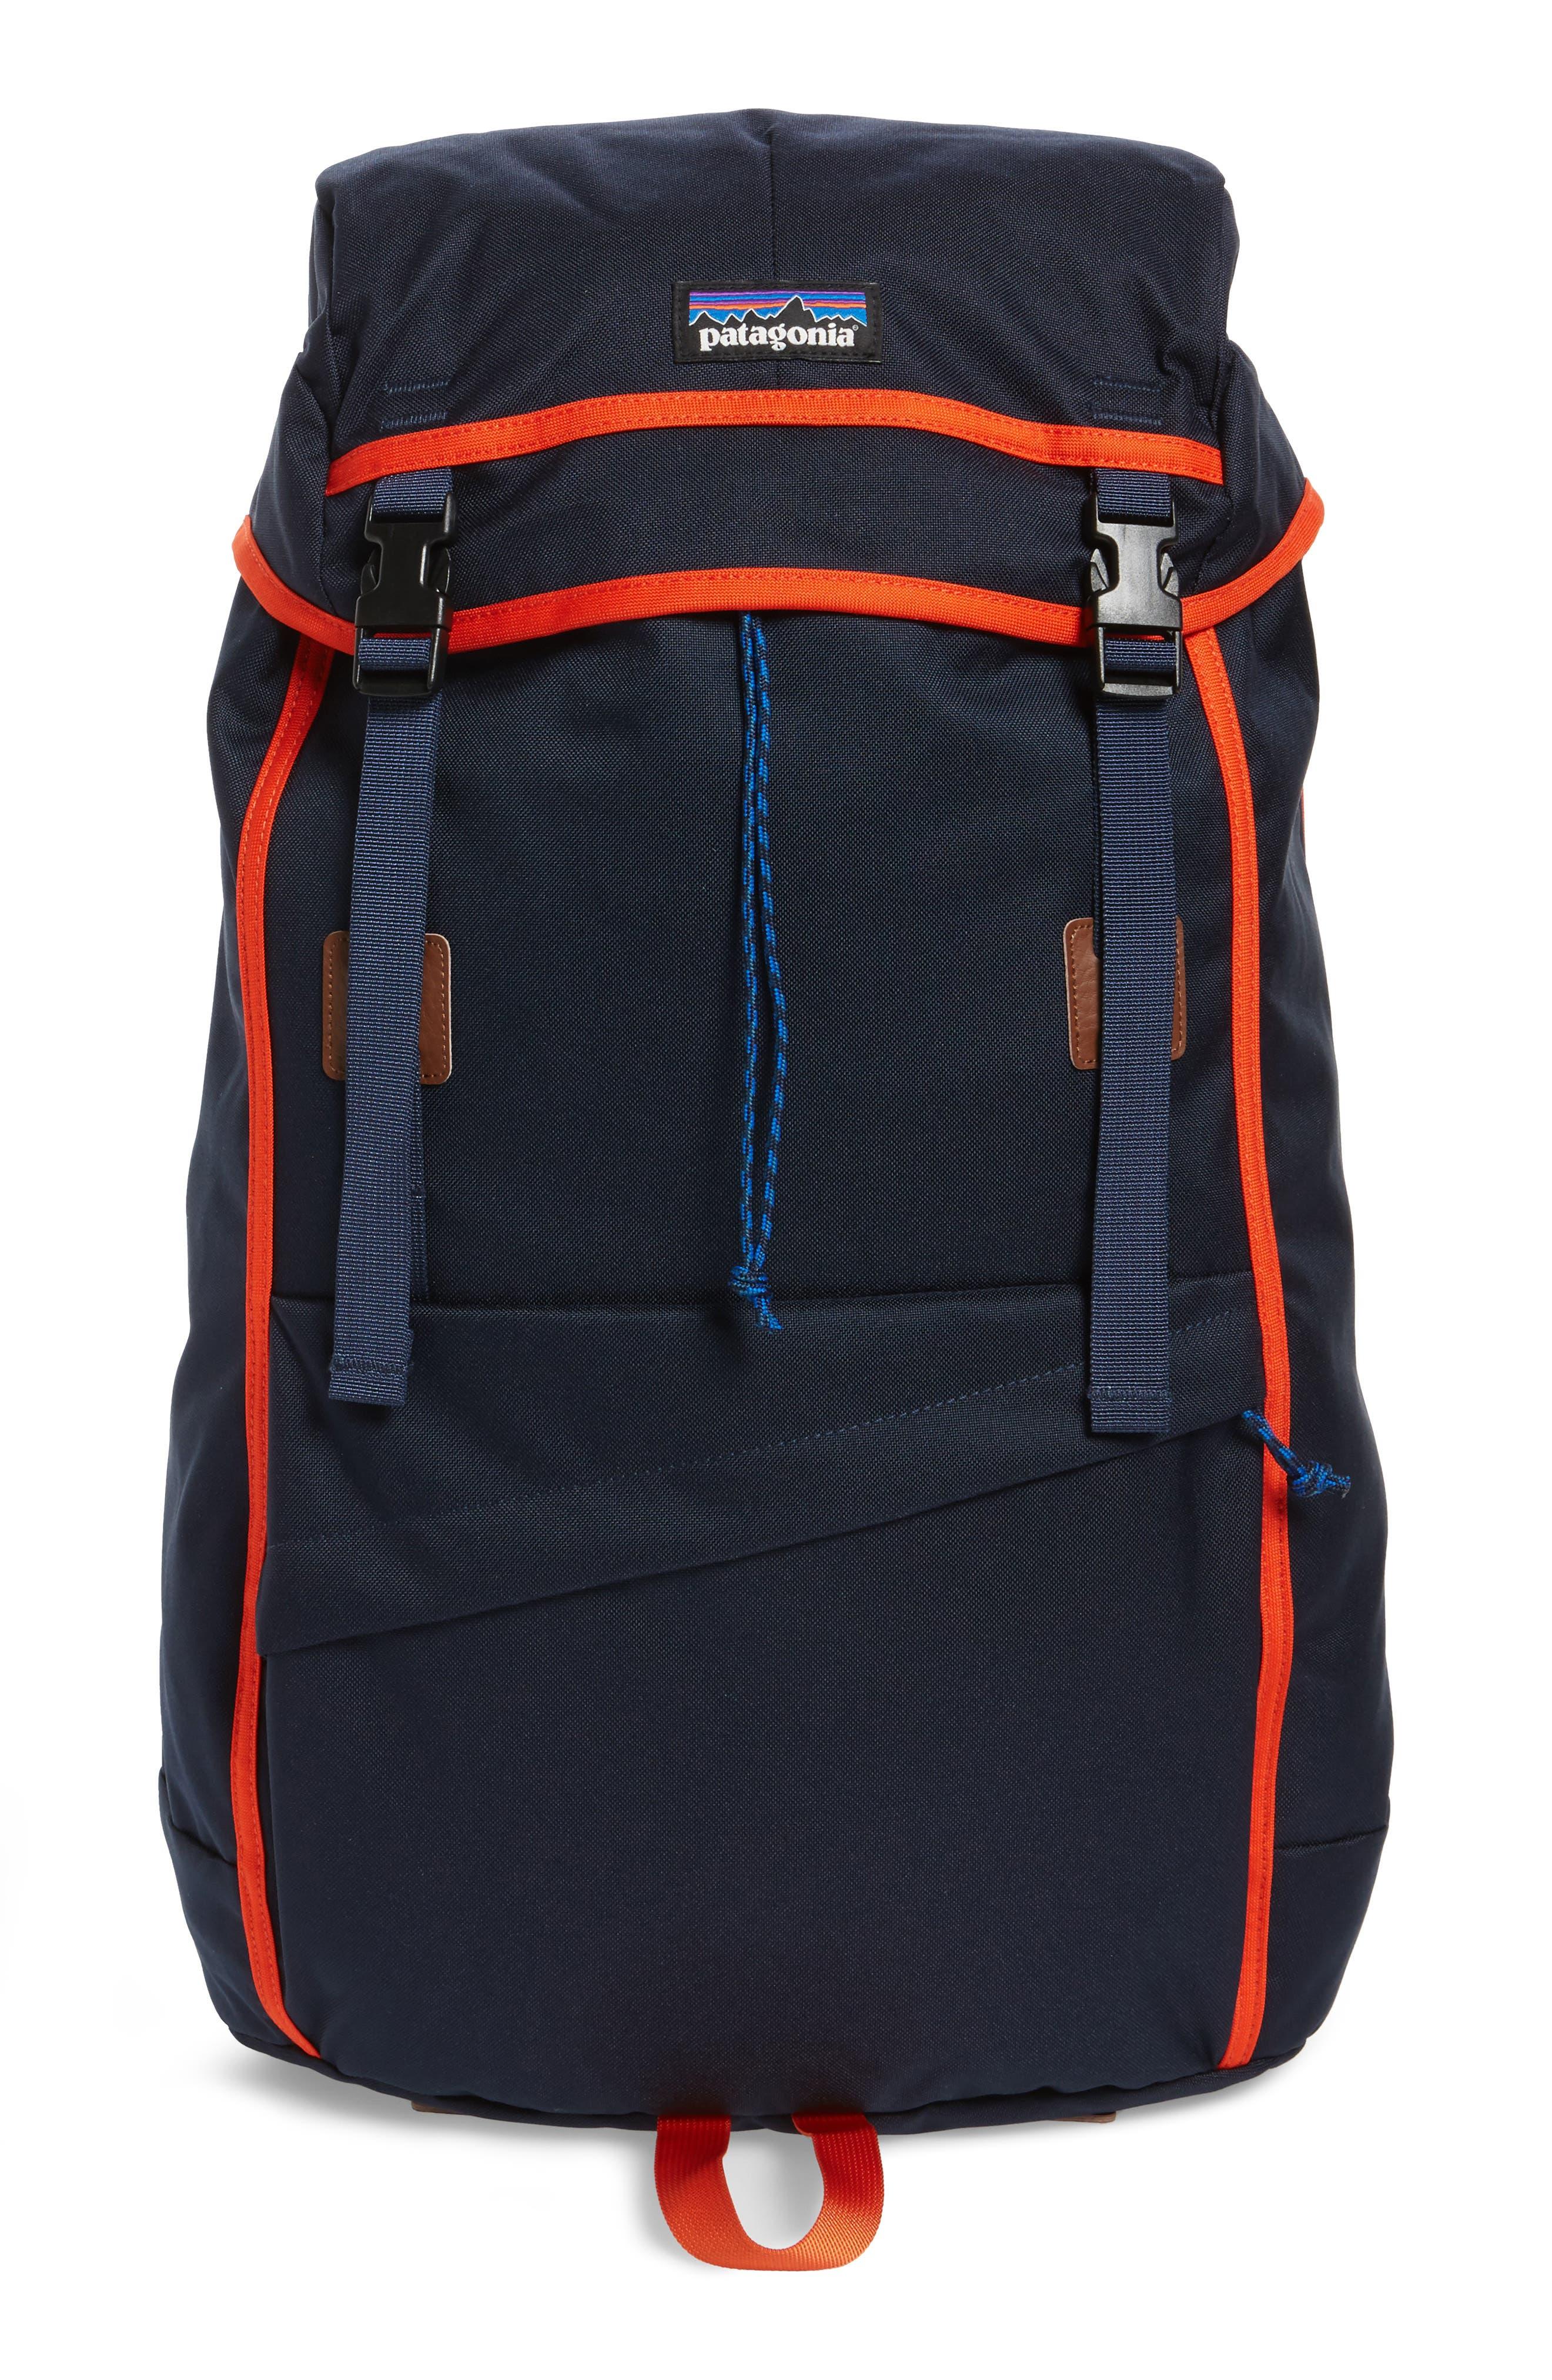 Arbor Grande 32-Liter Backpack,                         Main,                         color, Navy Blue/ Paintbrush Red